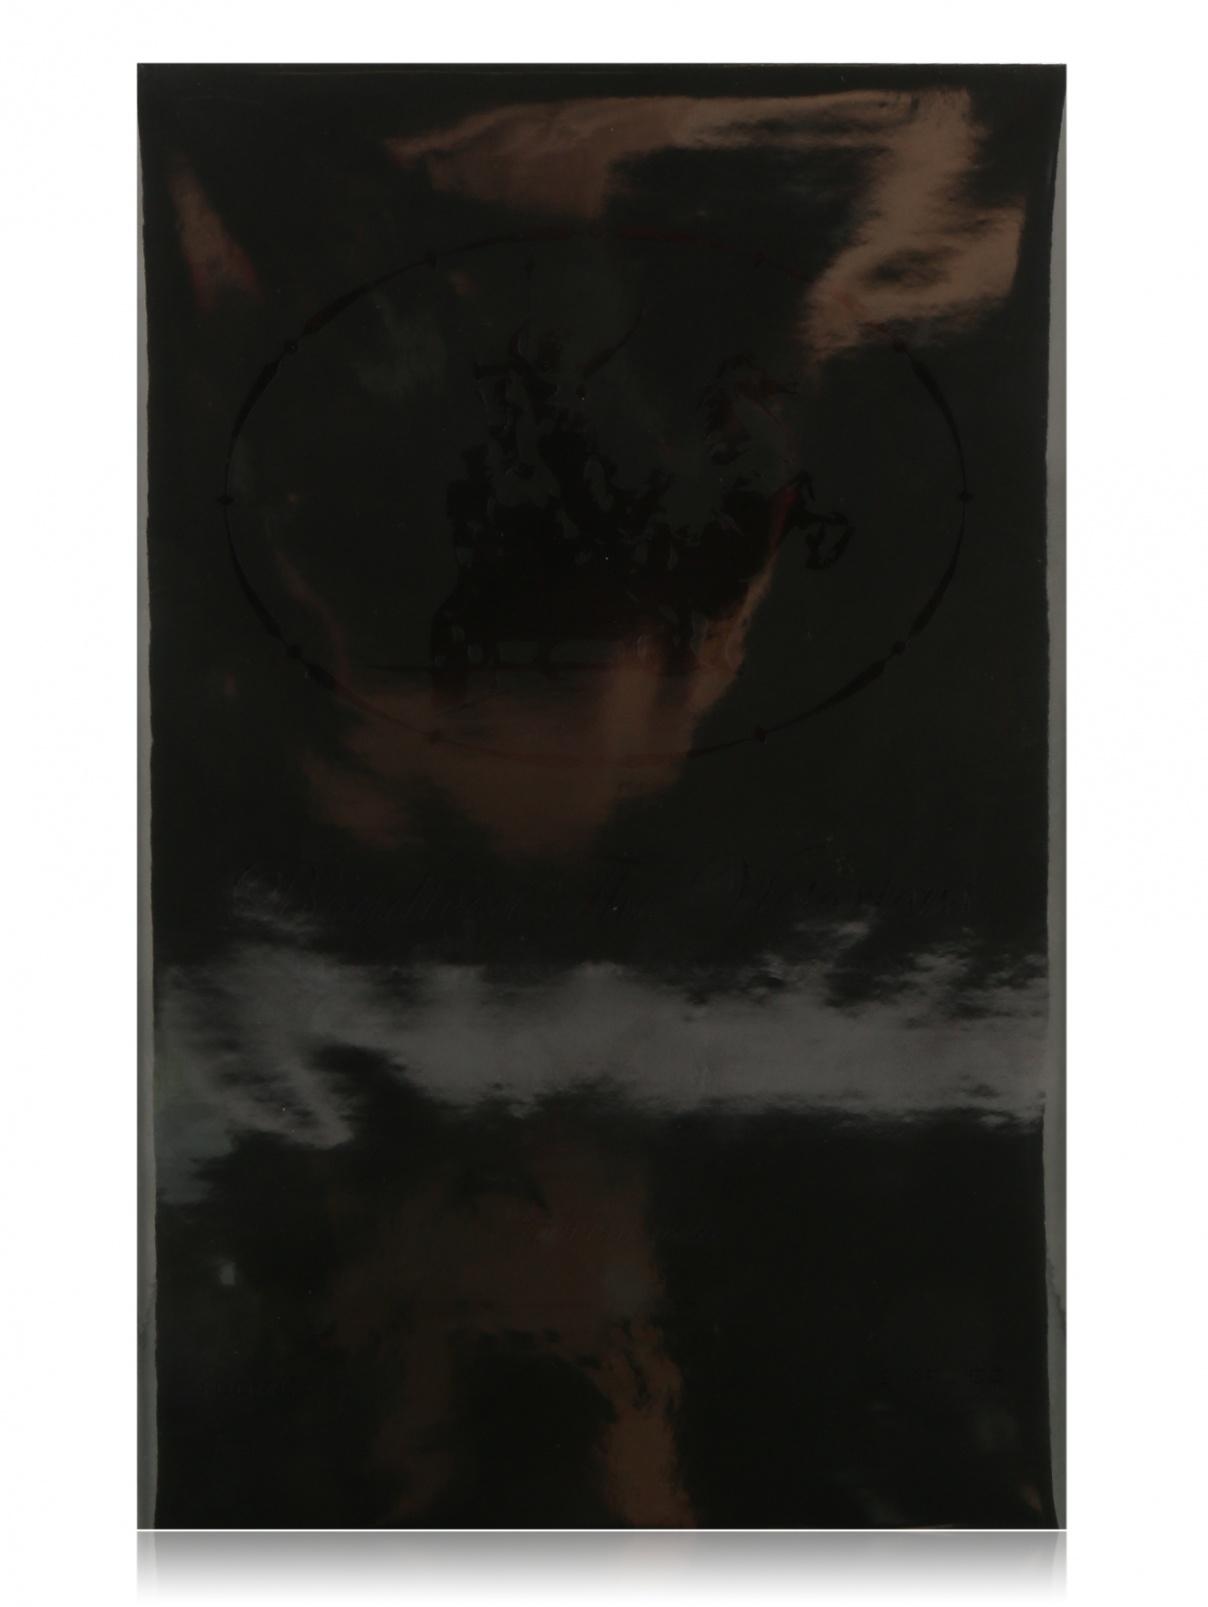 Парфюмерия Boadicea  –  Общий вид